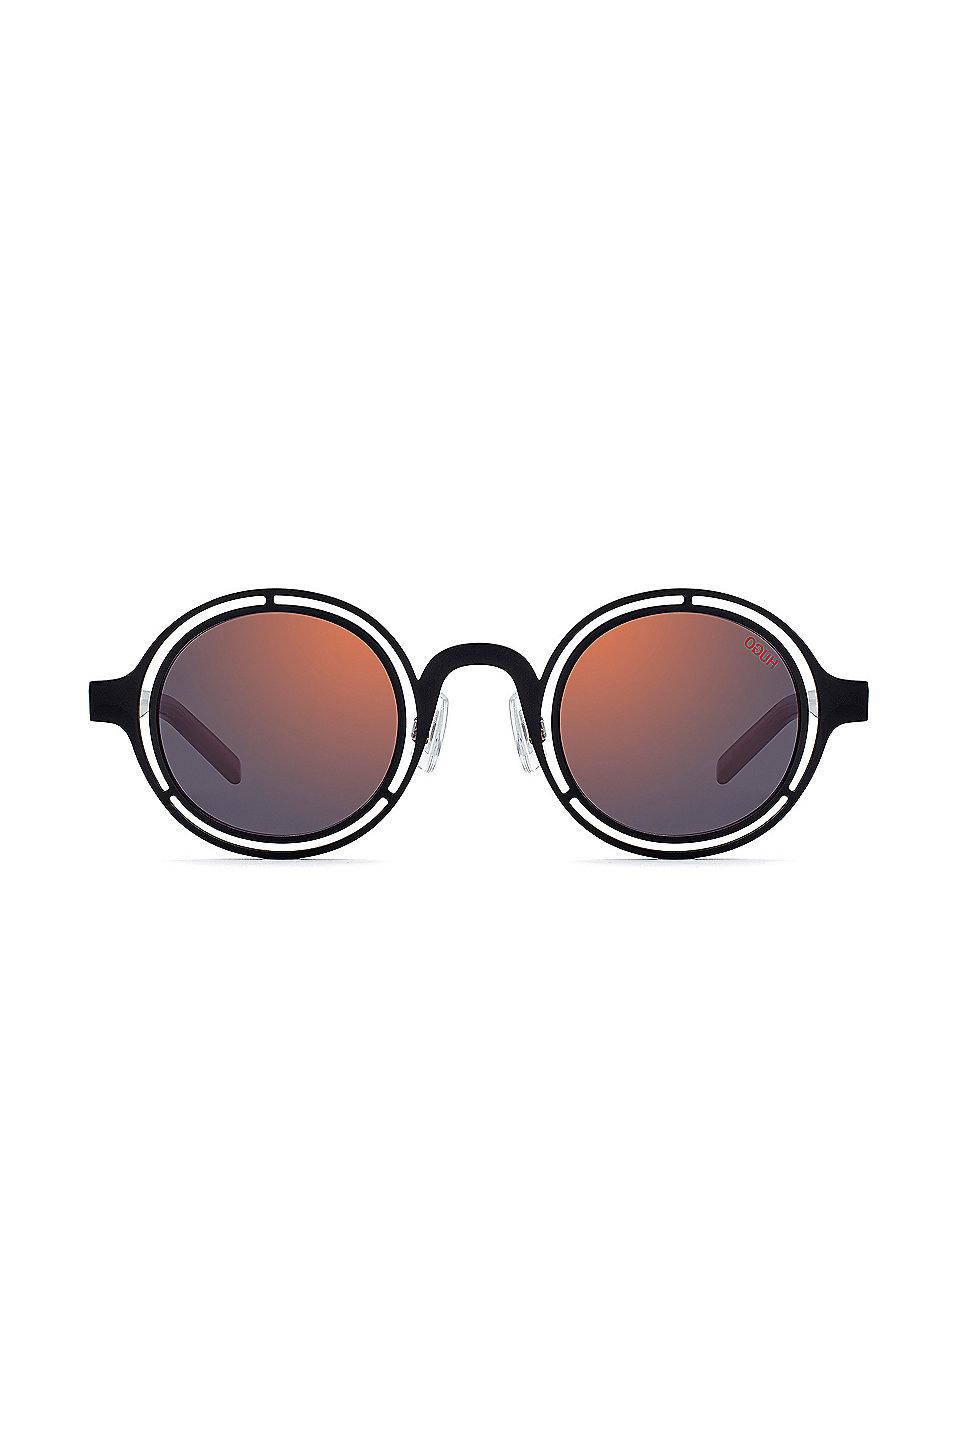 a047993c5b4a0 HUGO - Round sunglasses with matte-black steel frames